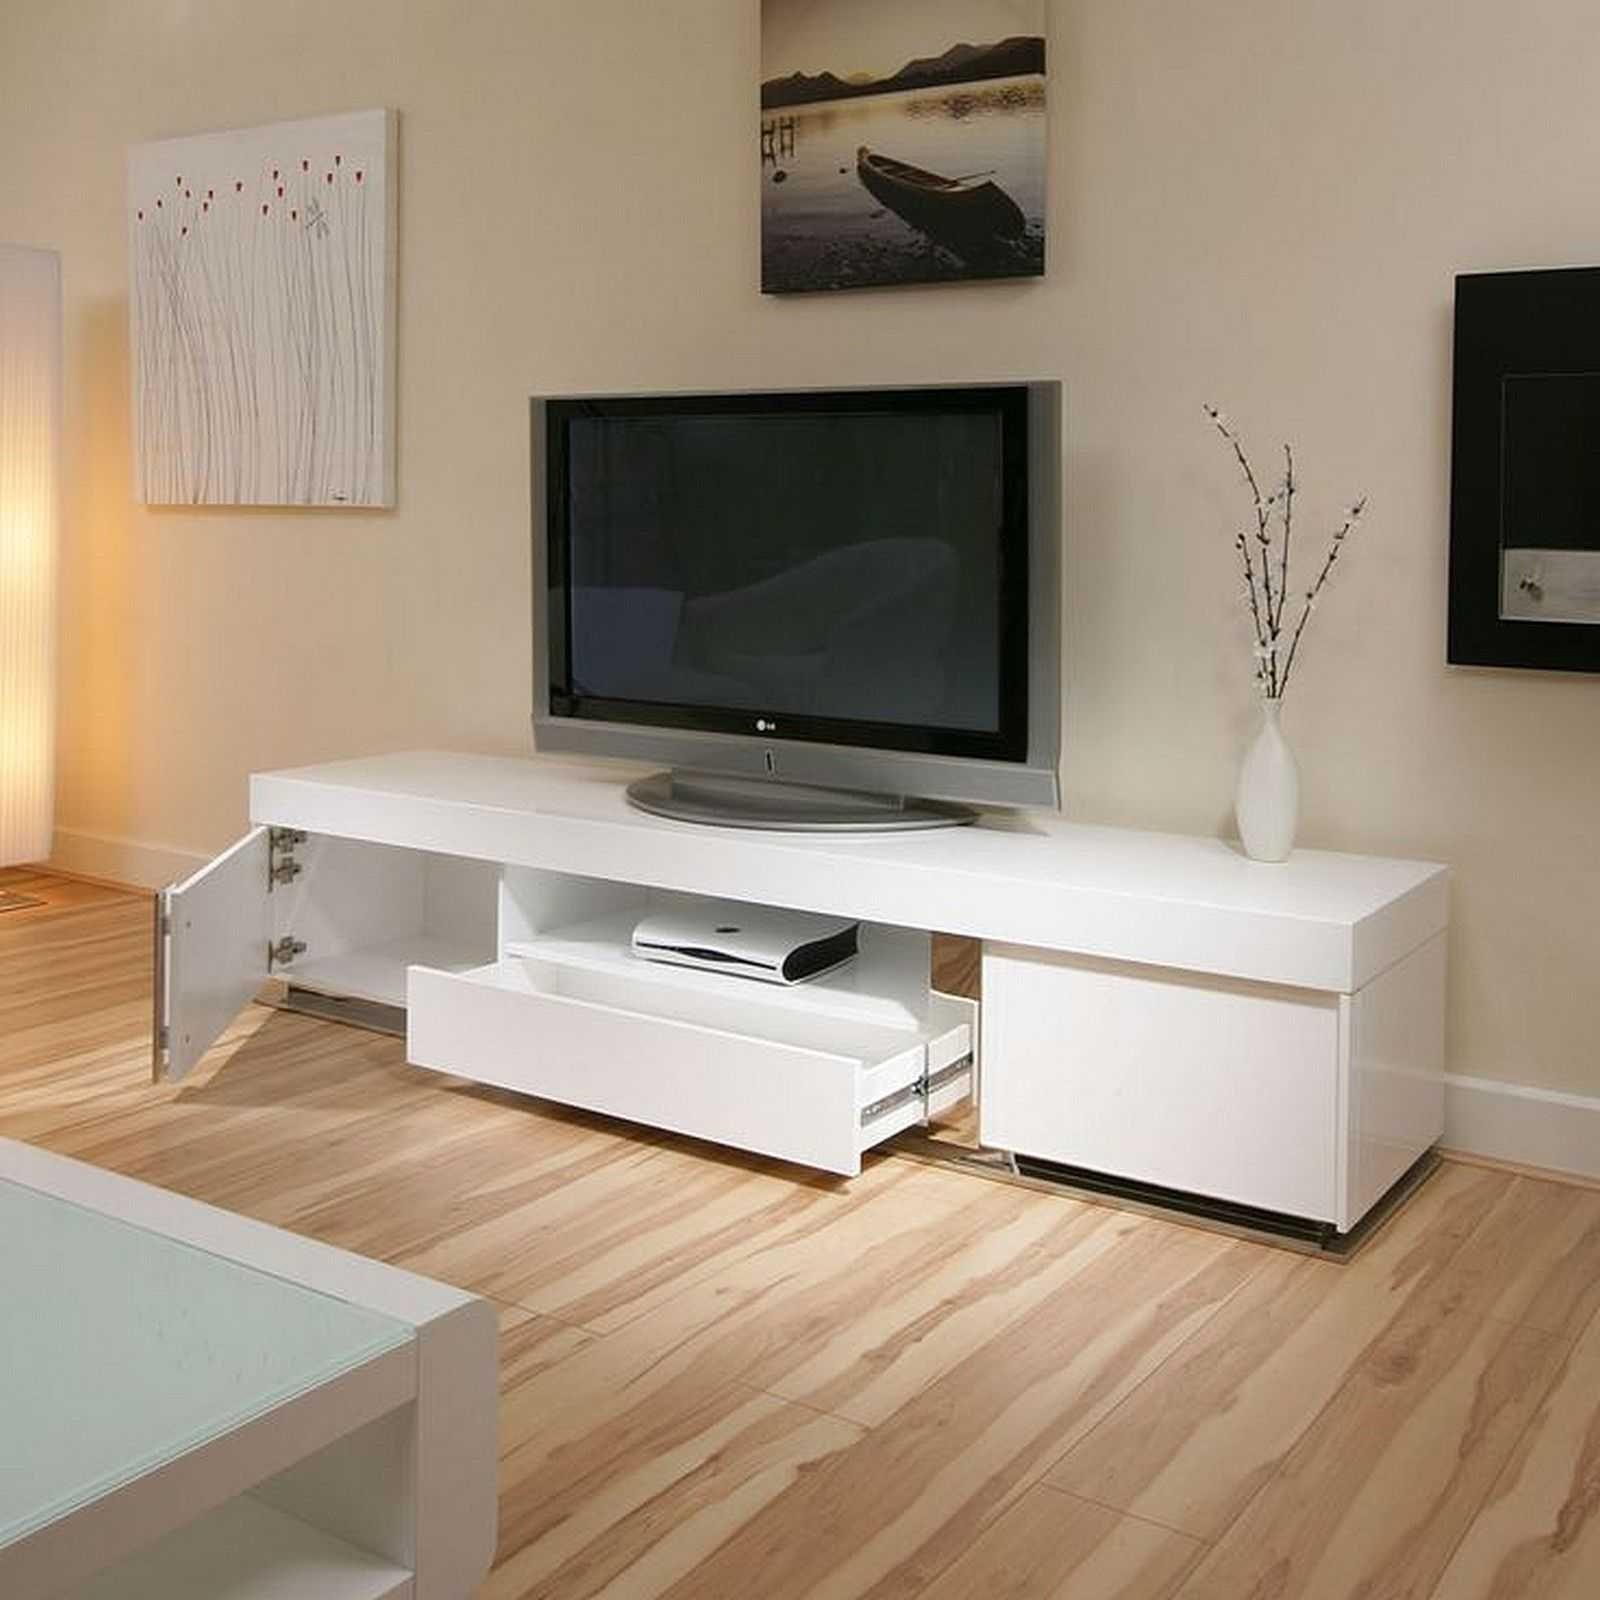 Meuble Ikea Besta Blanc Épinglé sur мебель